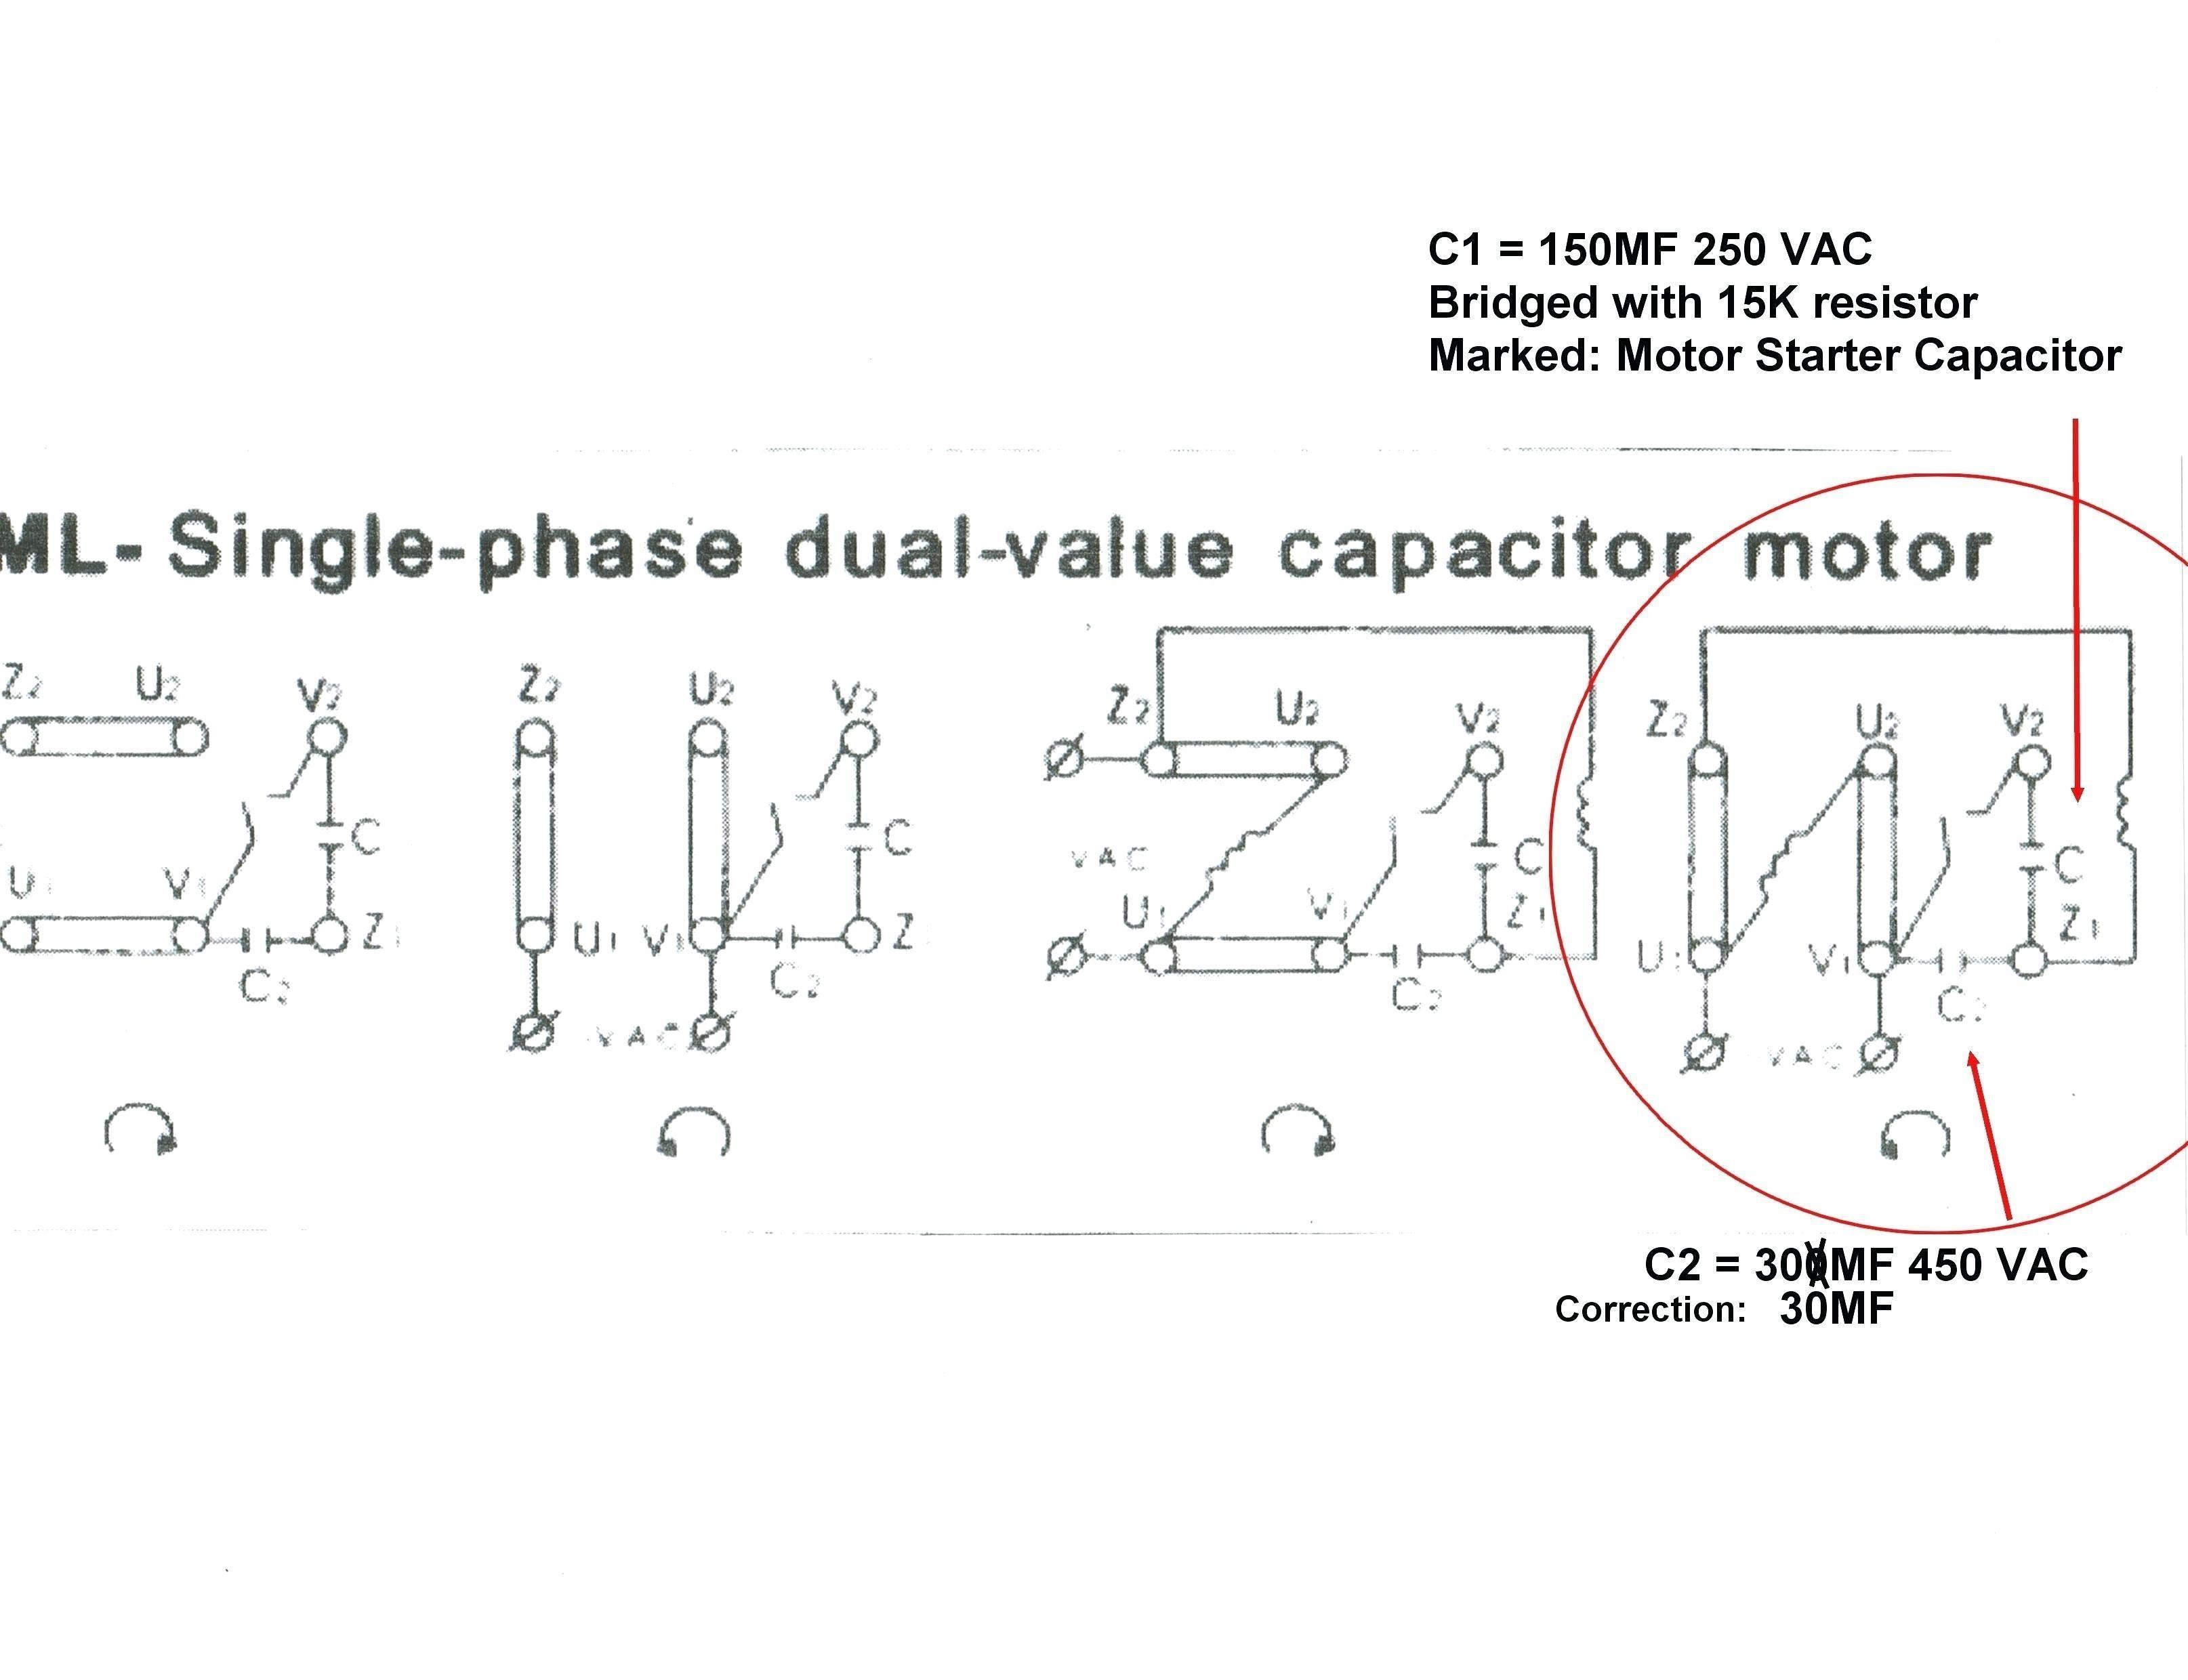 6 lead single phase motor wiring diagram pdf newmotorspot co rh newmotorspot co 6 lead single phase motor wiring diagram 6 lead single phase motor wiring diagram pdf